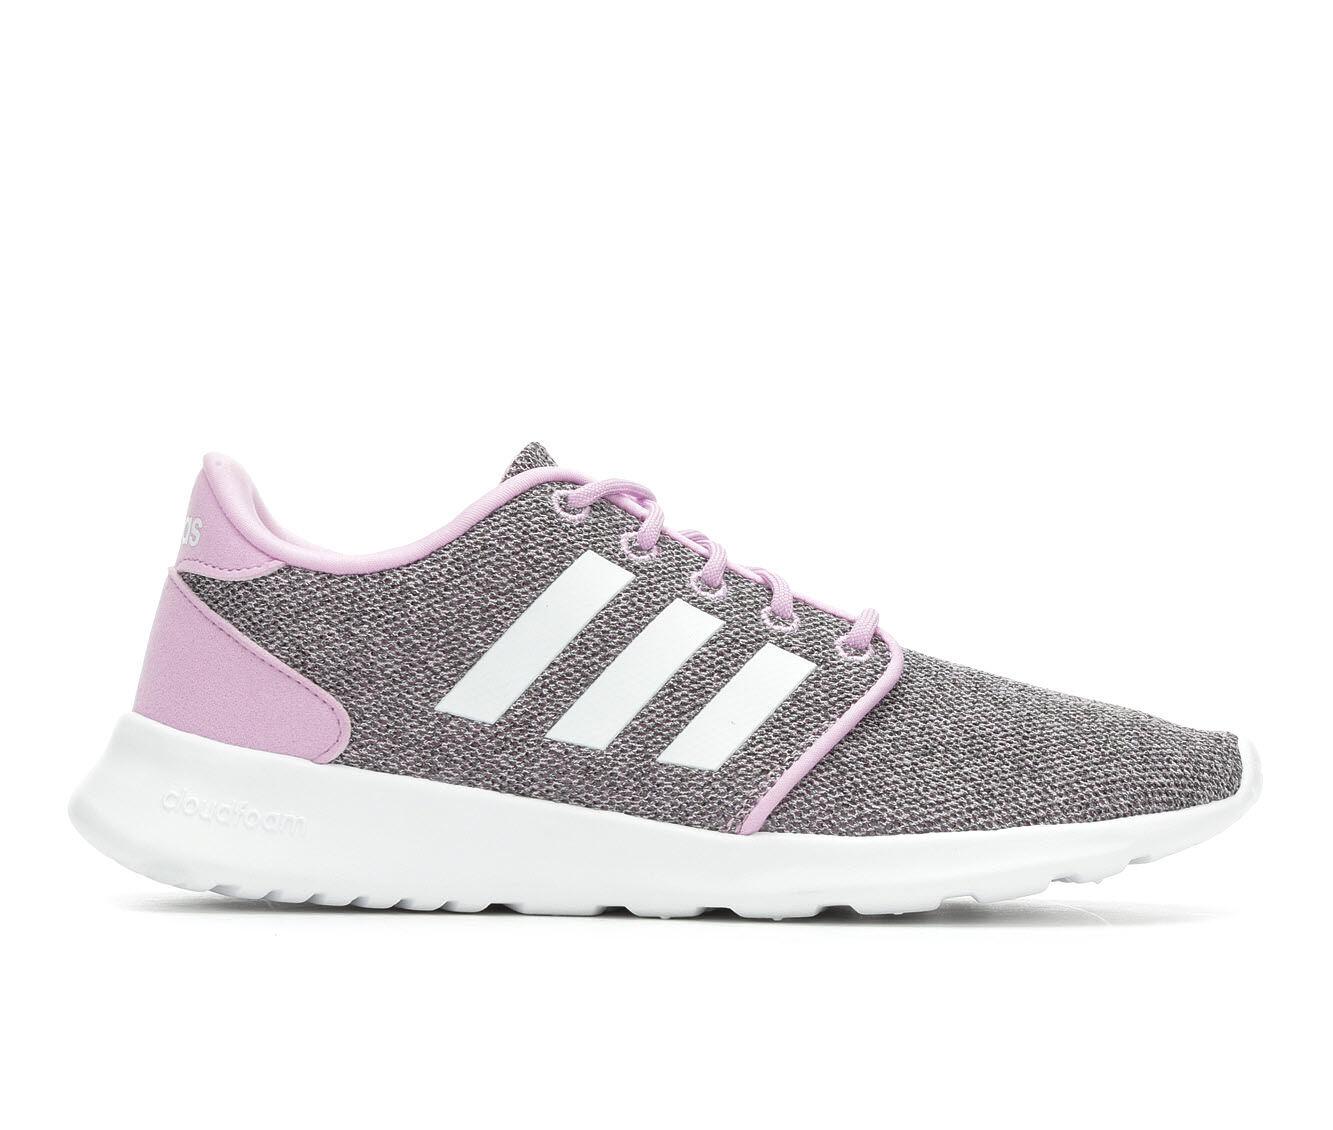 Women's Adidas Cloudfoam QT Racer Sneakers Lilac/White